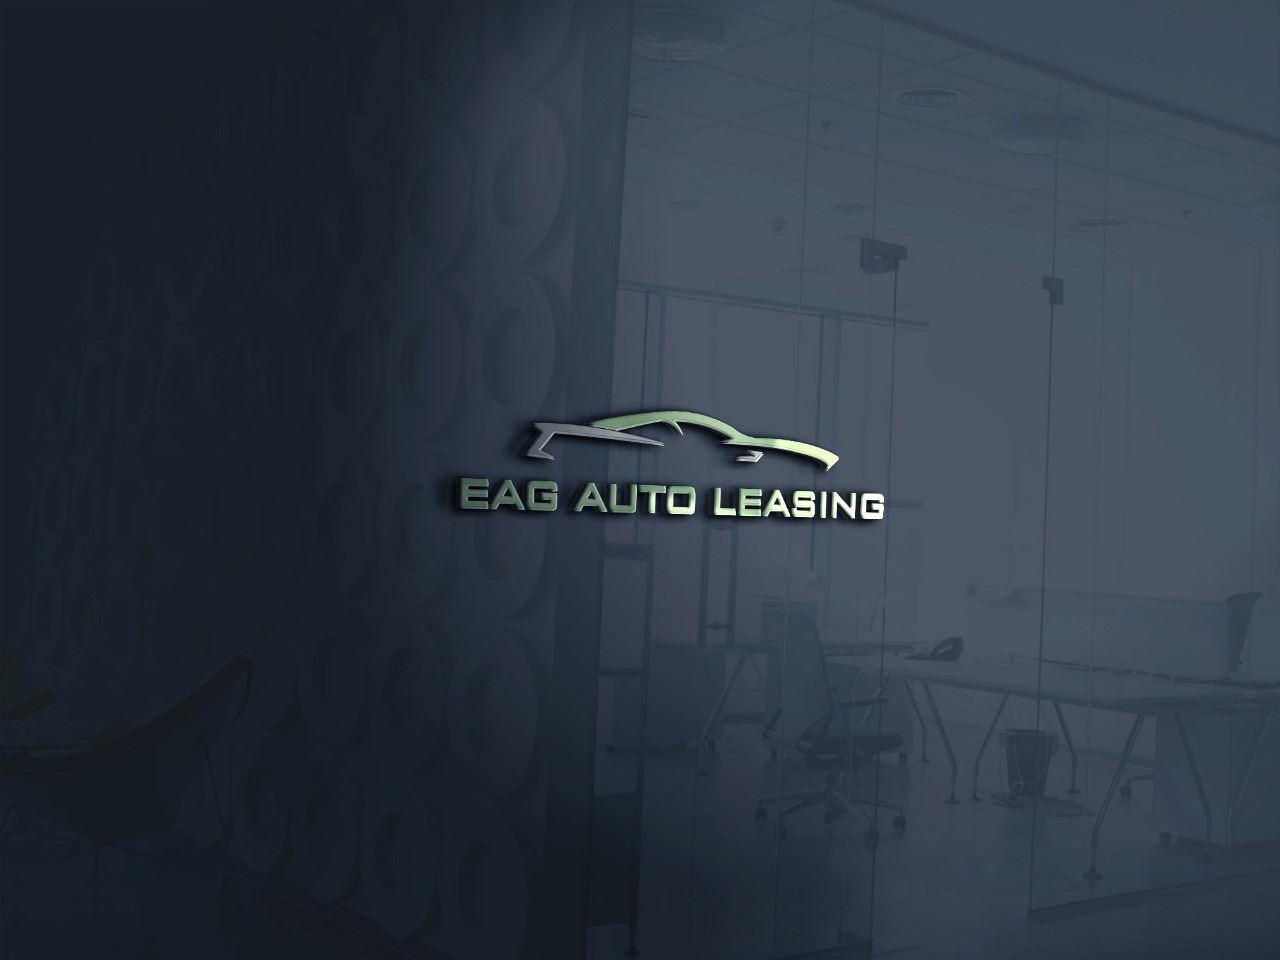 EAG Auto Leasing